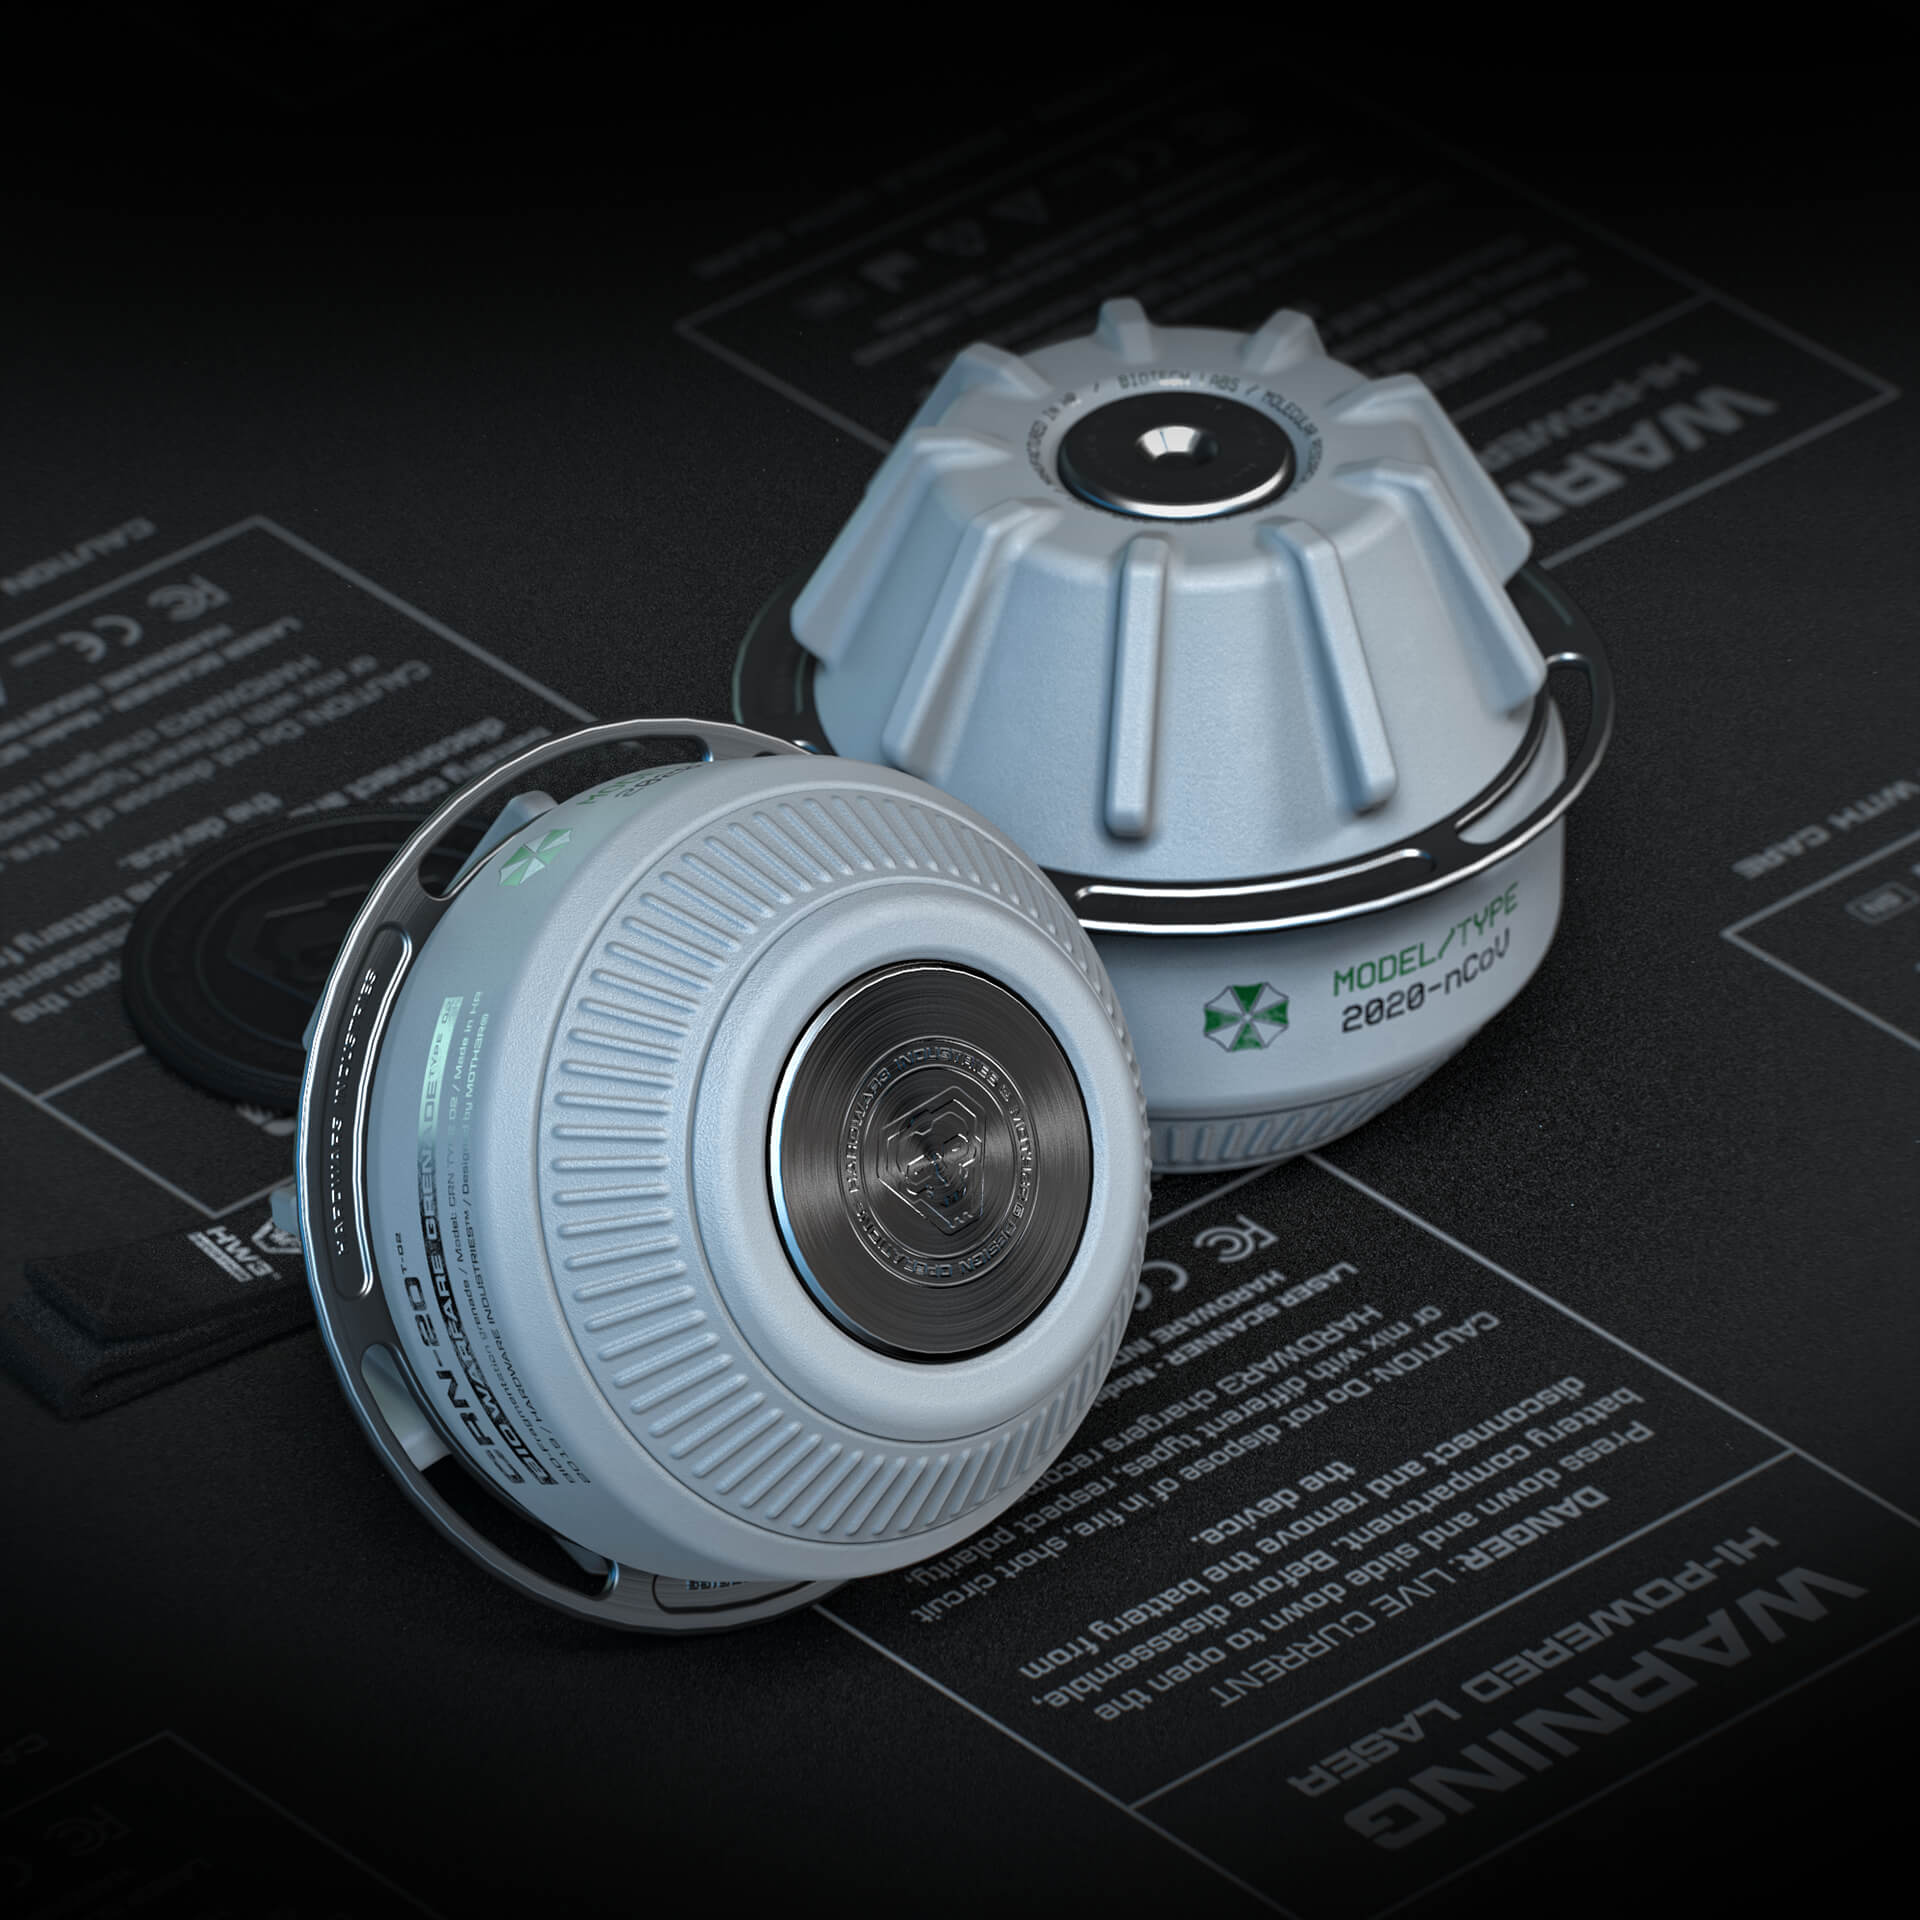 Scanner-001.121-Clean